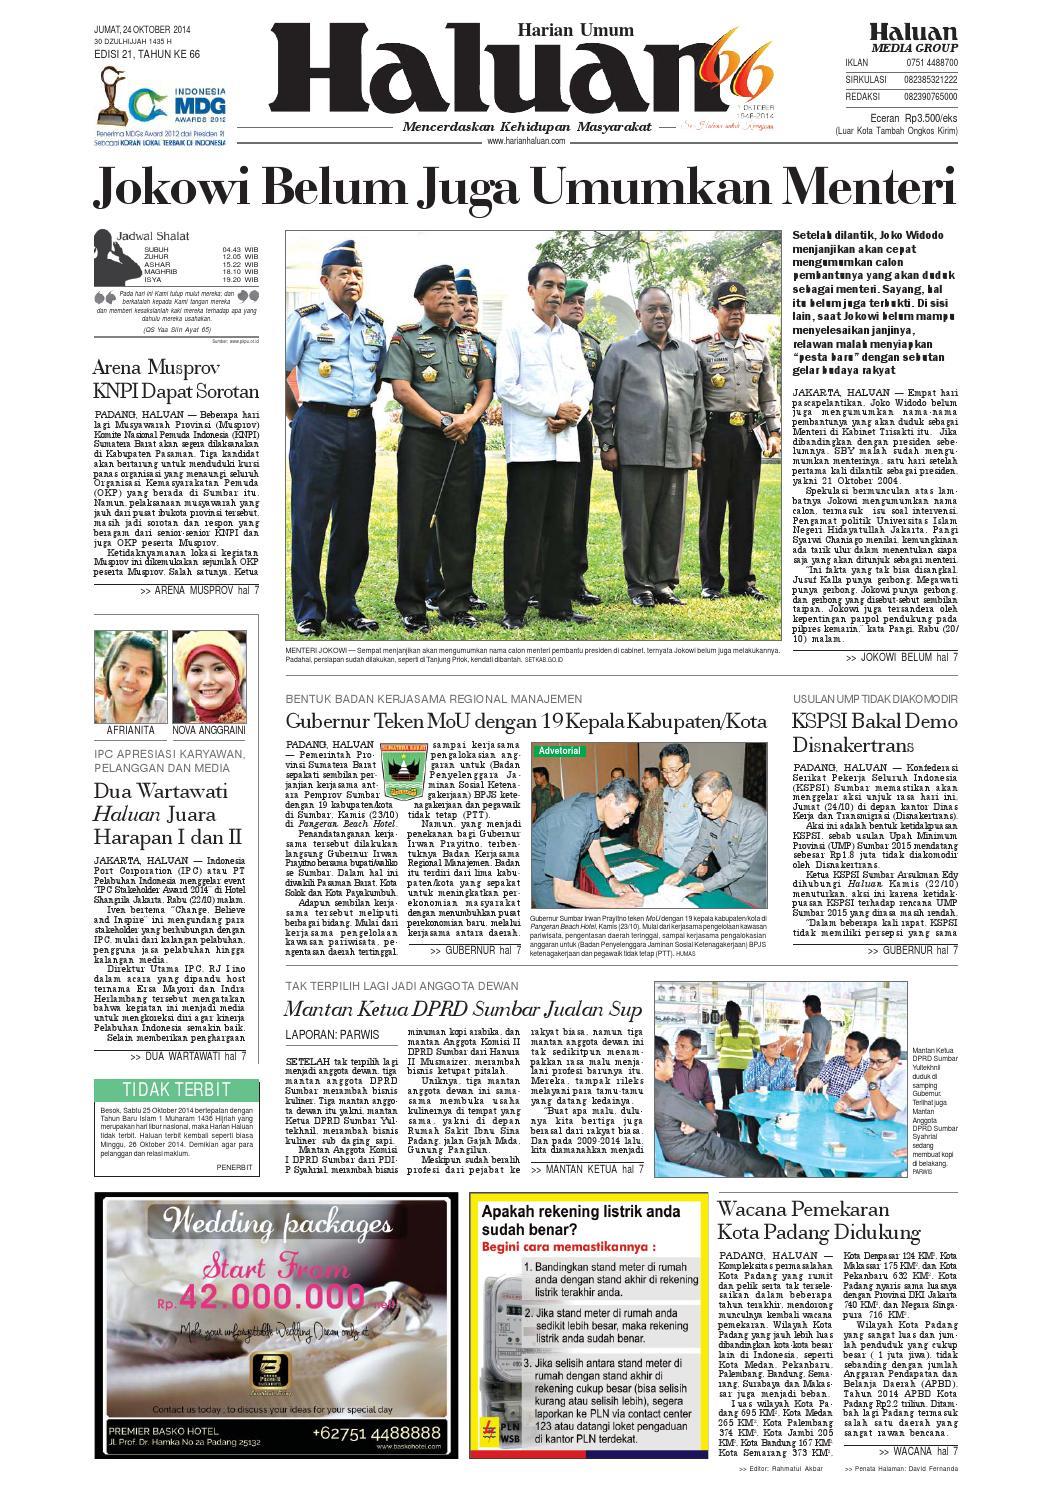 Haluan 24 Oktober 2014 by Harian Haluan - issuu 93eb01f605